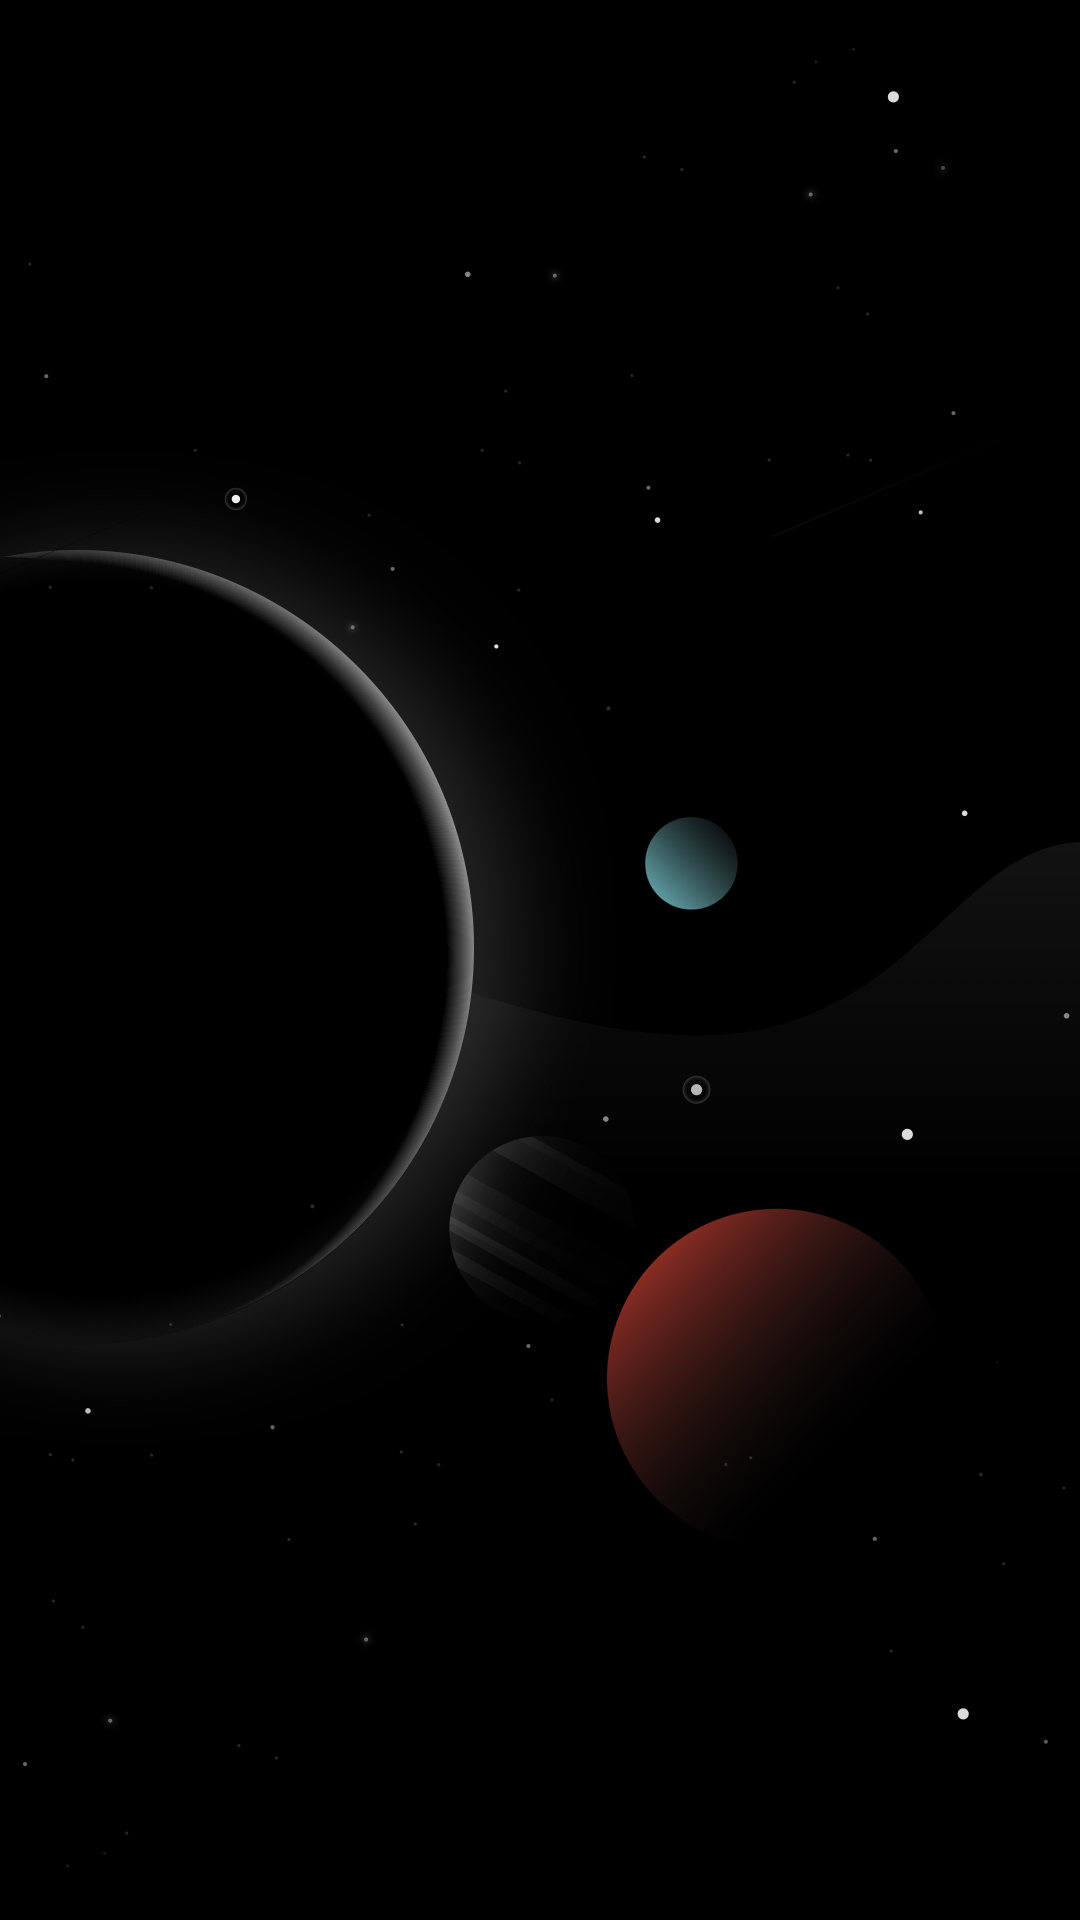 Space Dark iPhone Wallpaper